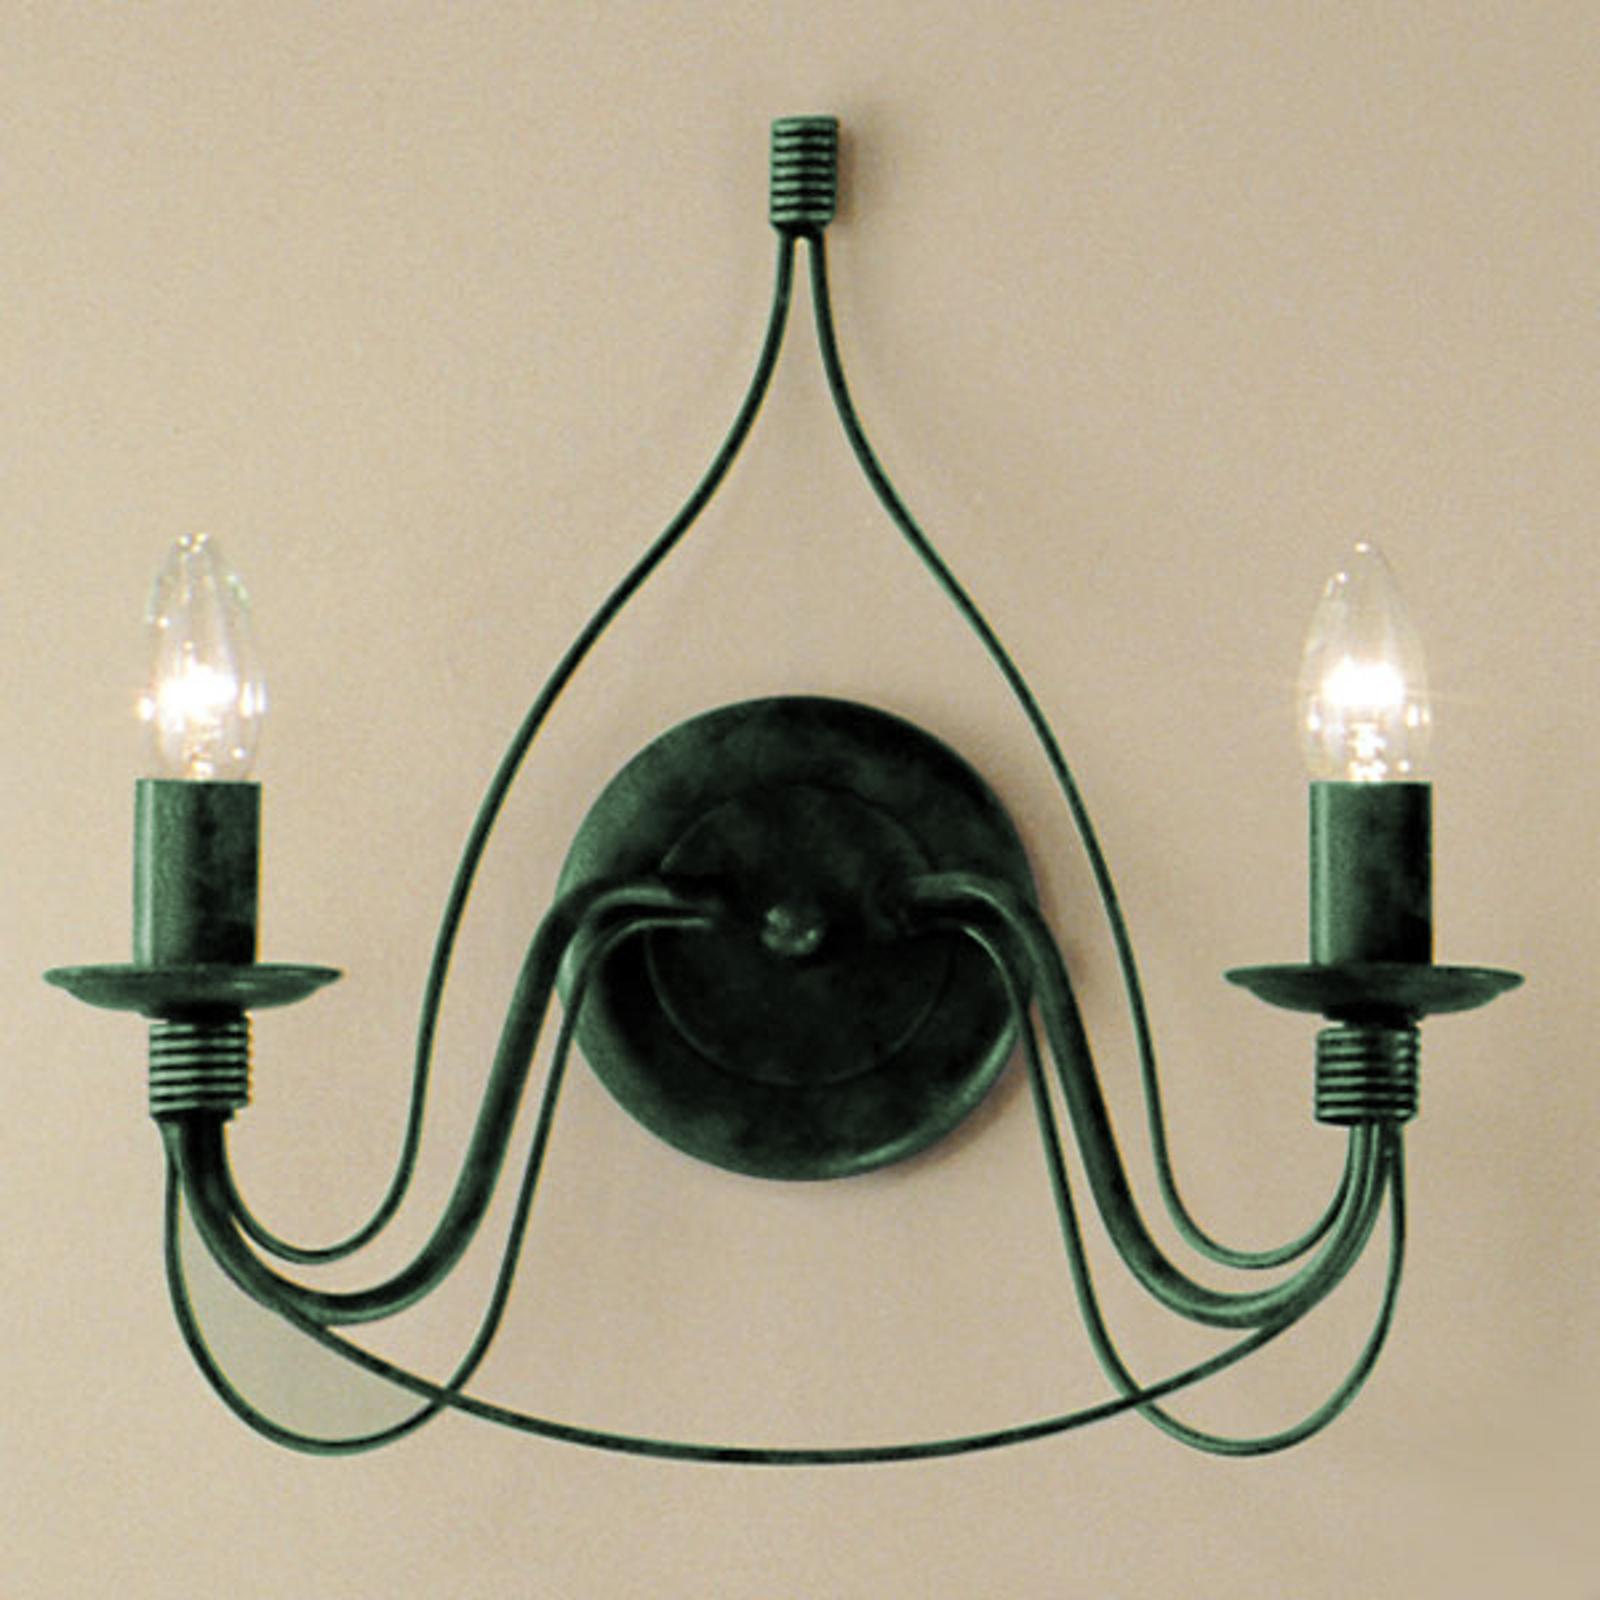 Vägglampa FILO 2-armad, grön antik